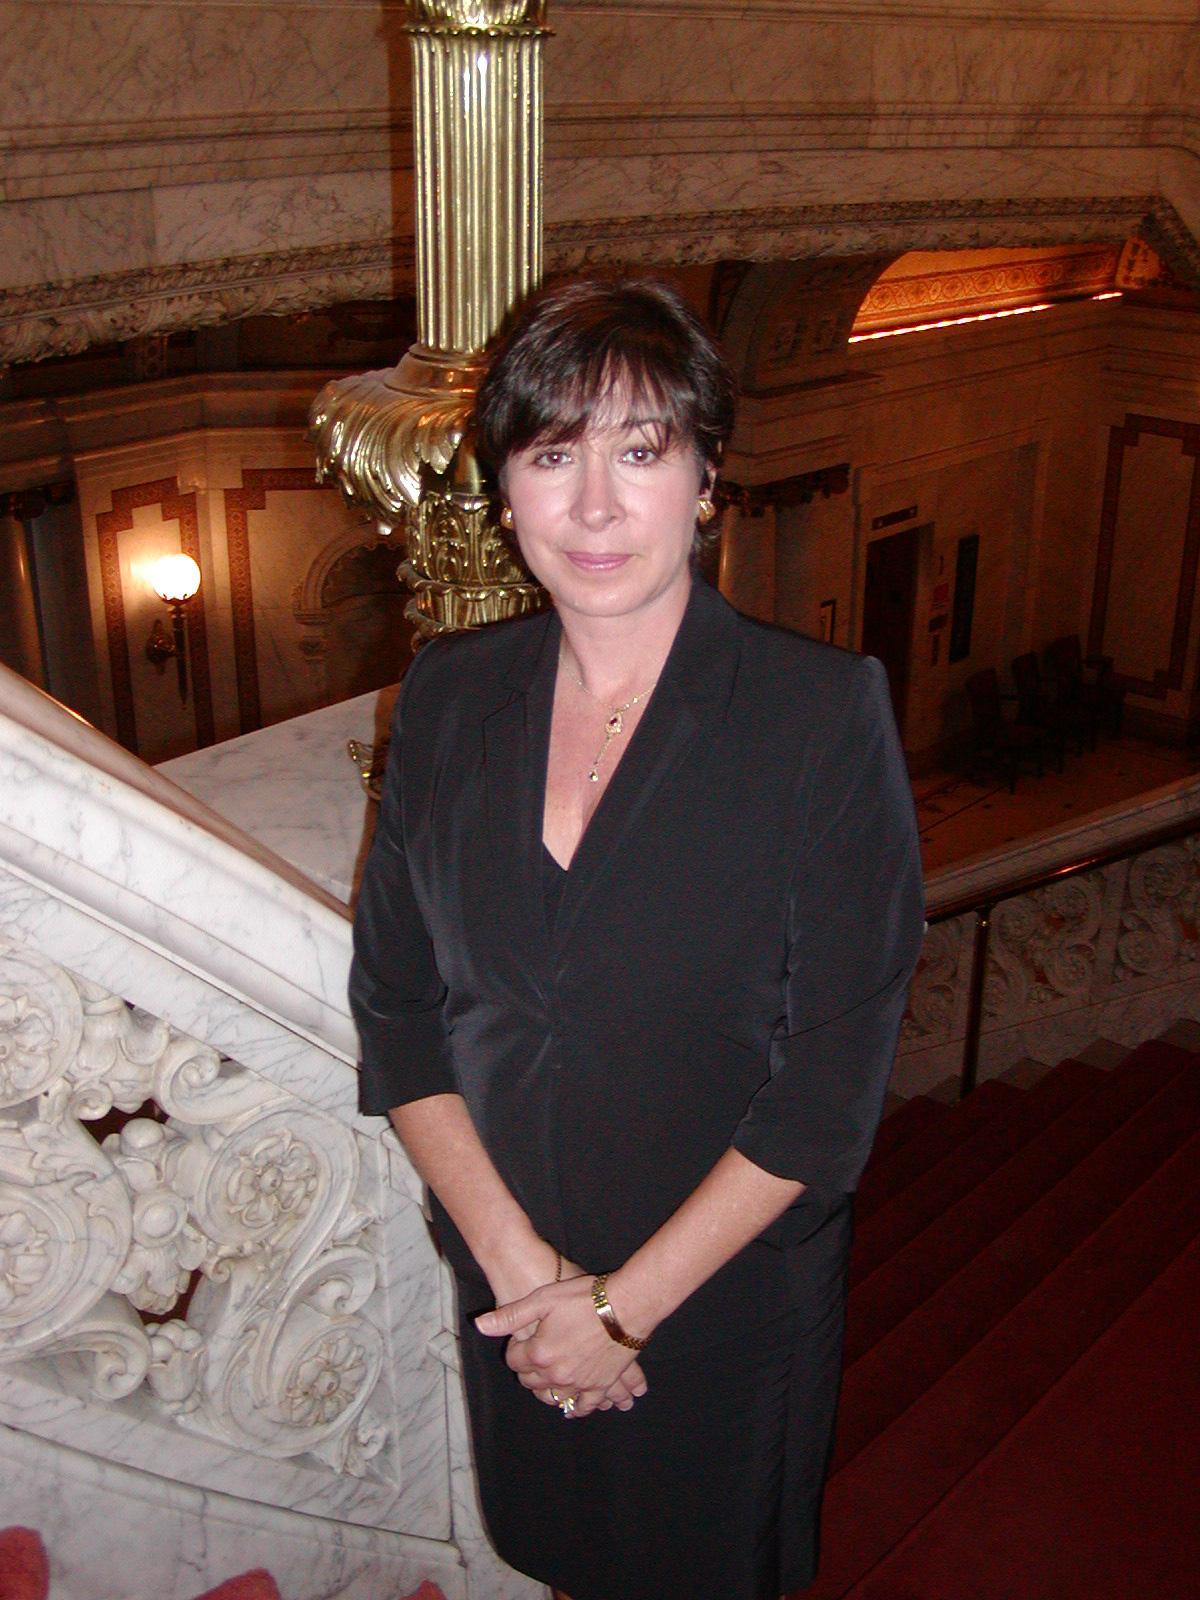 Judge Debra A. Pezze